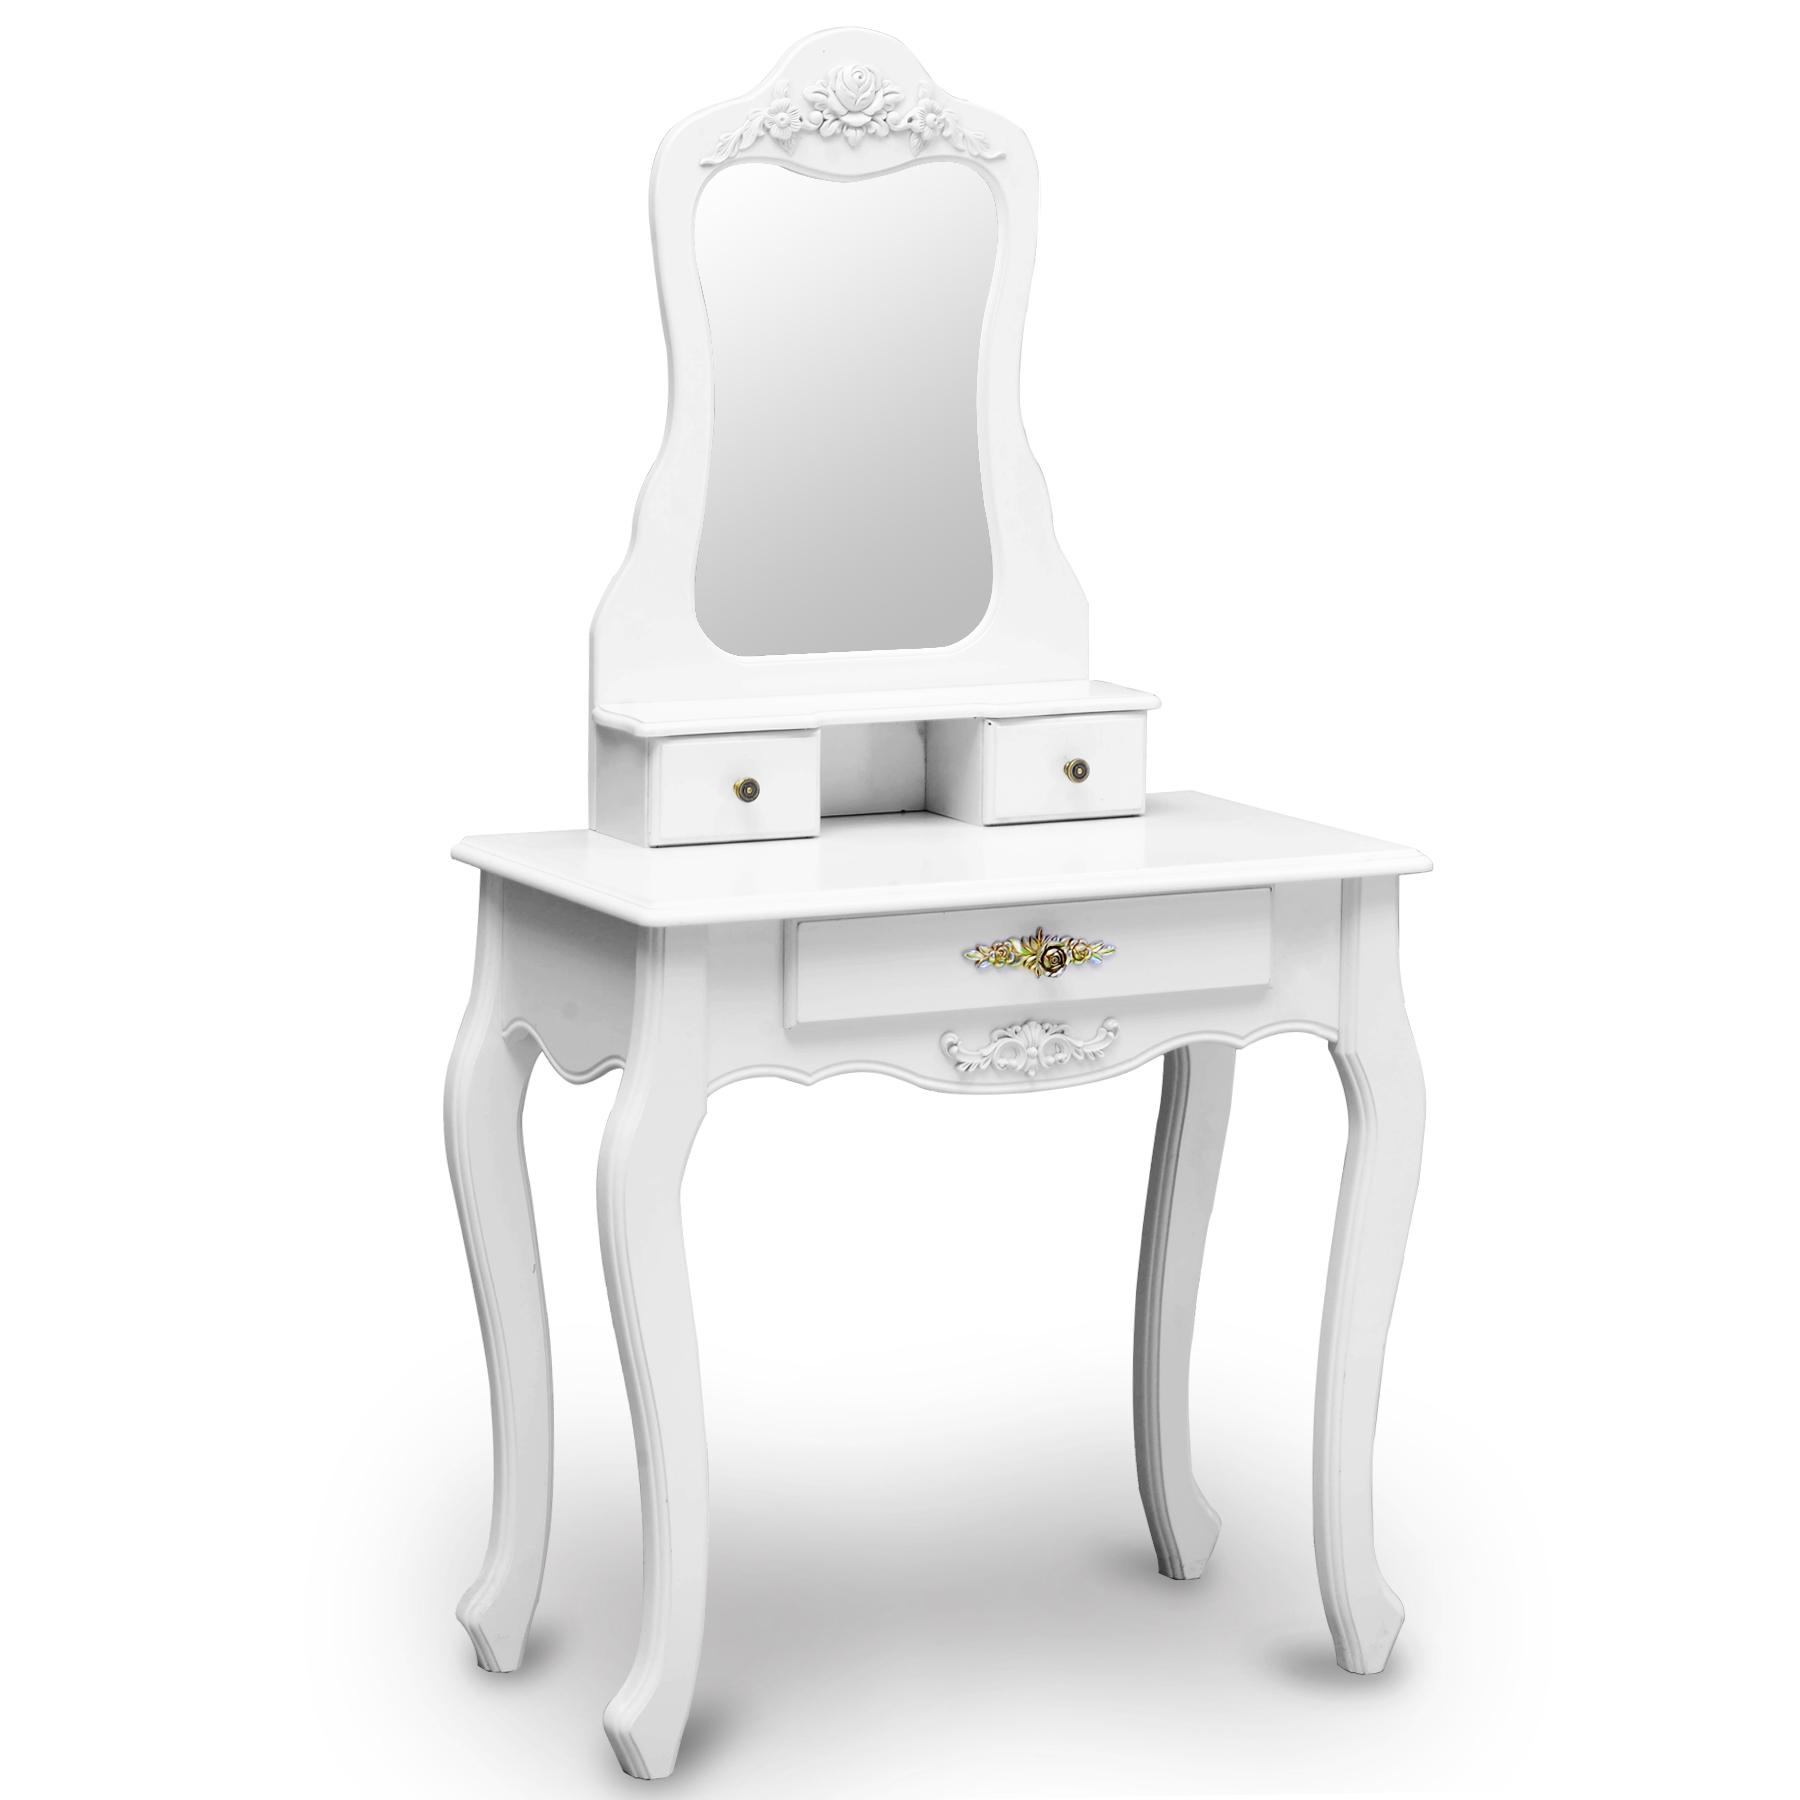 Mobel Mobel Wohnen Schminkhocker Hocker Sitzhocker Tischhocker